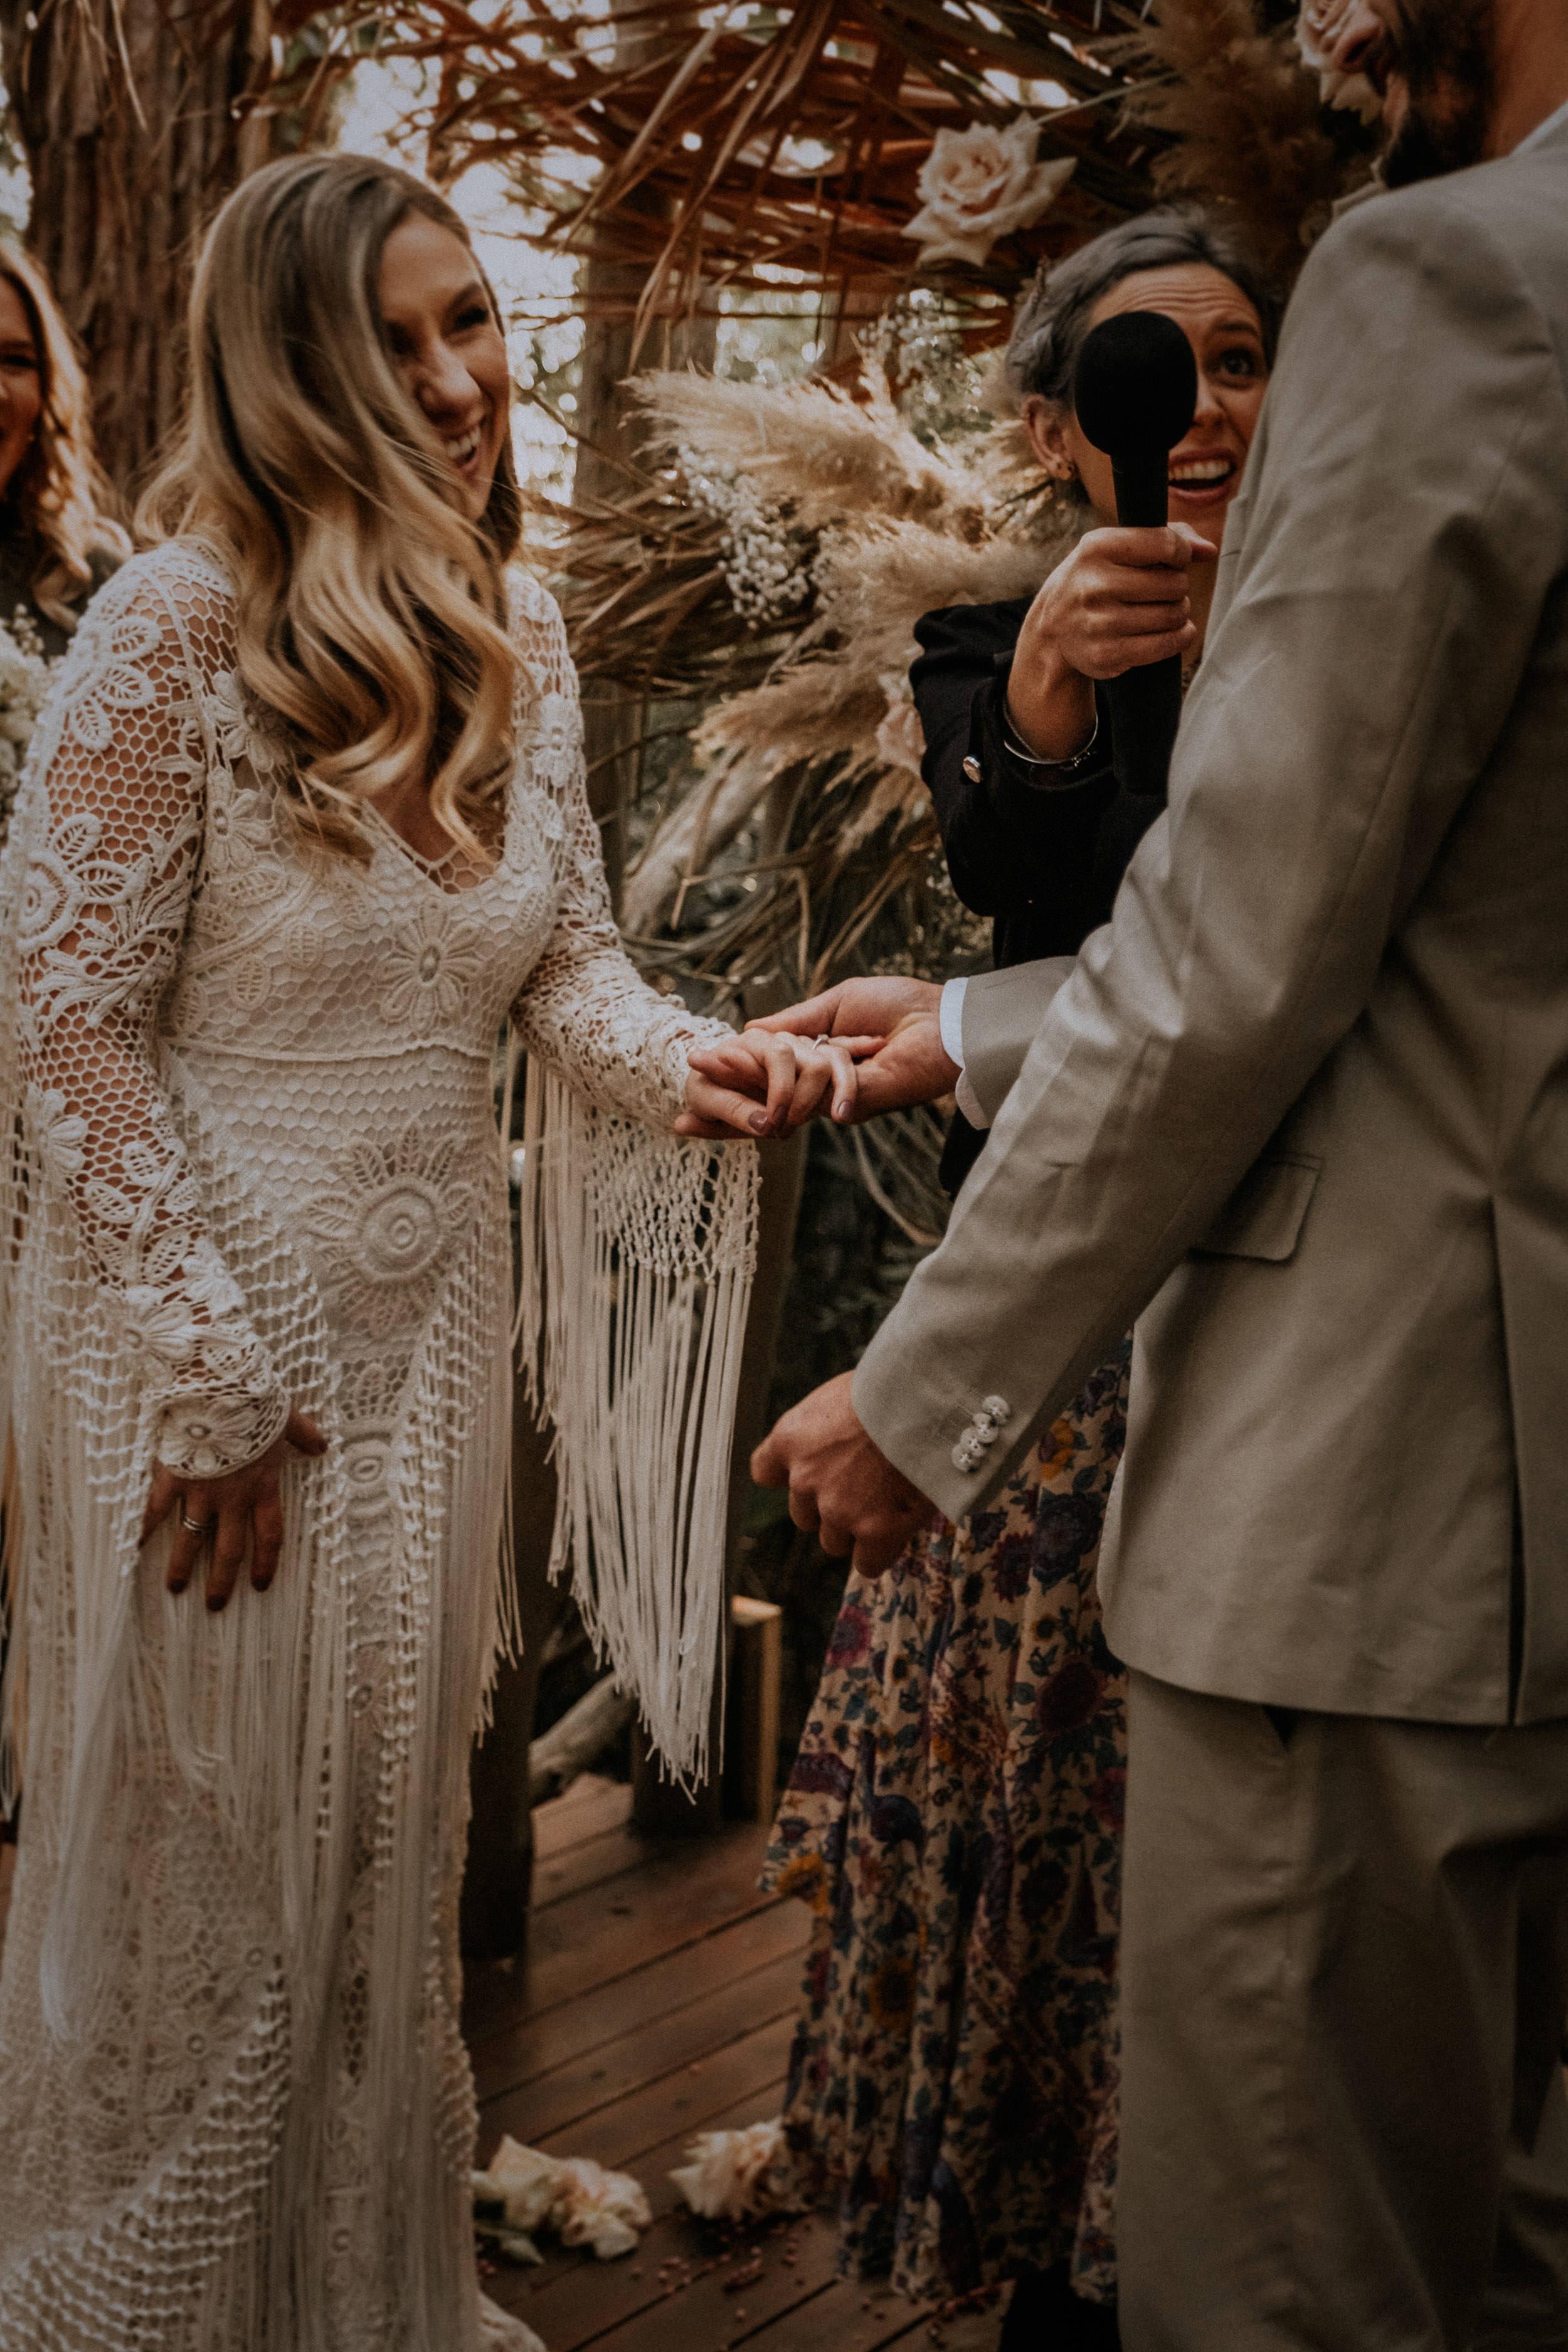 S&A Elopement - Kings & Thieves - Shred 'Til Dead - Central Coast Beach Forest Wedding - 215.jpg